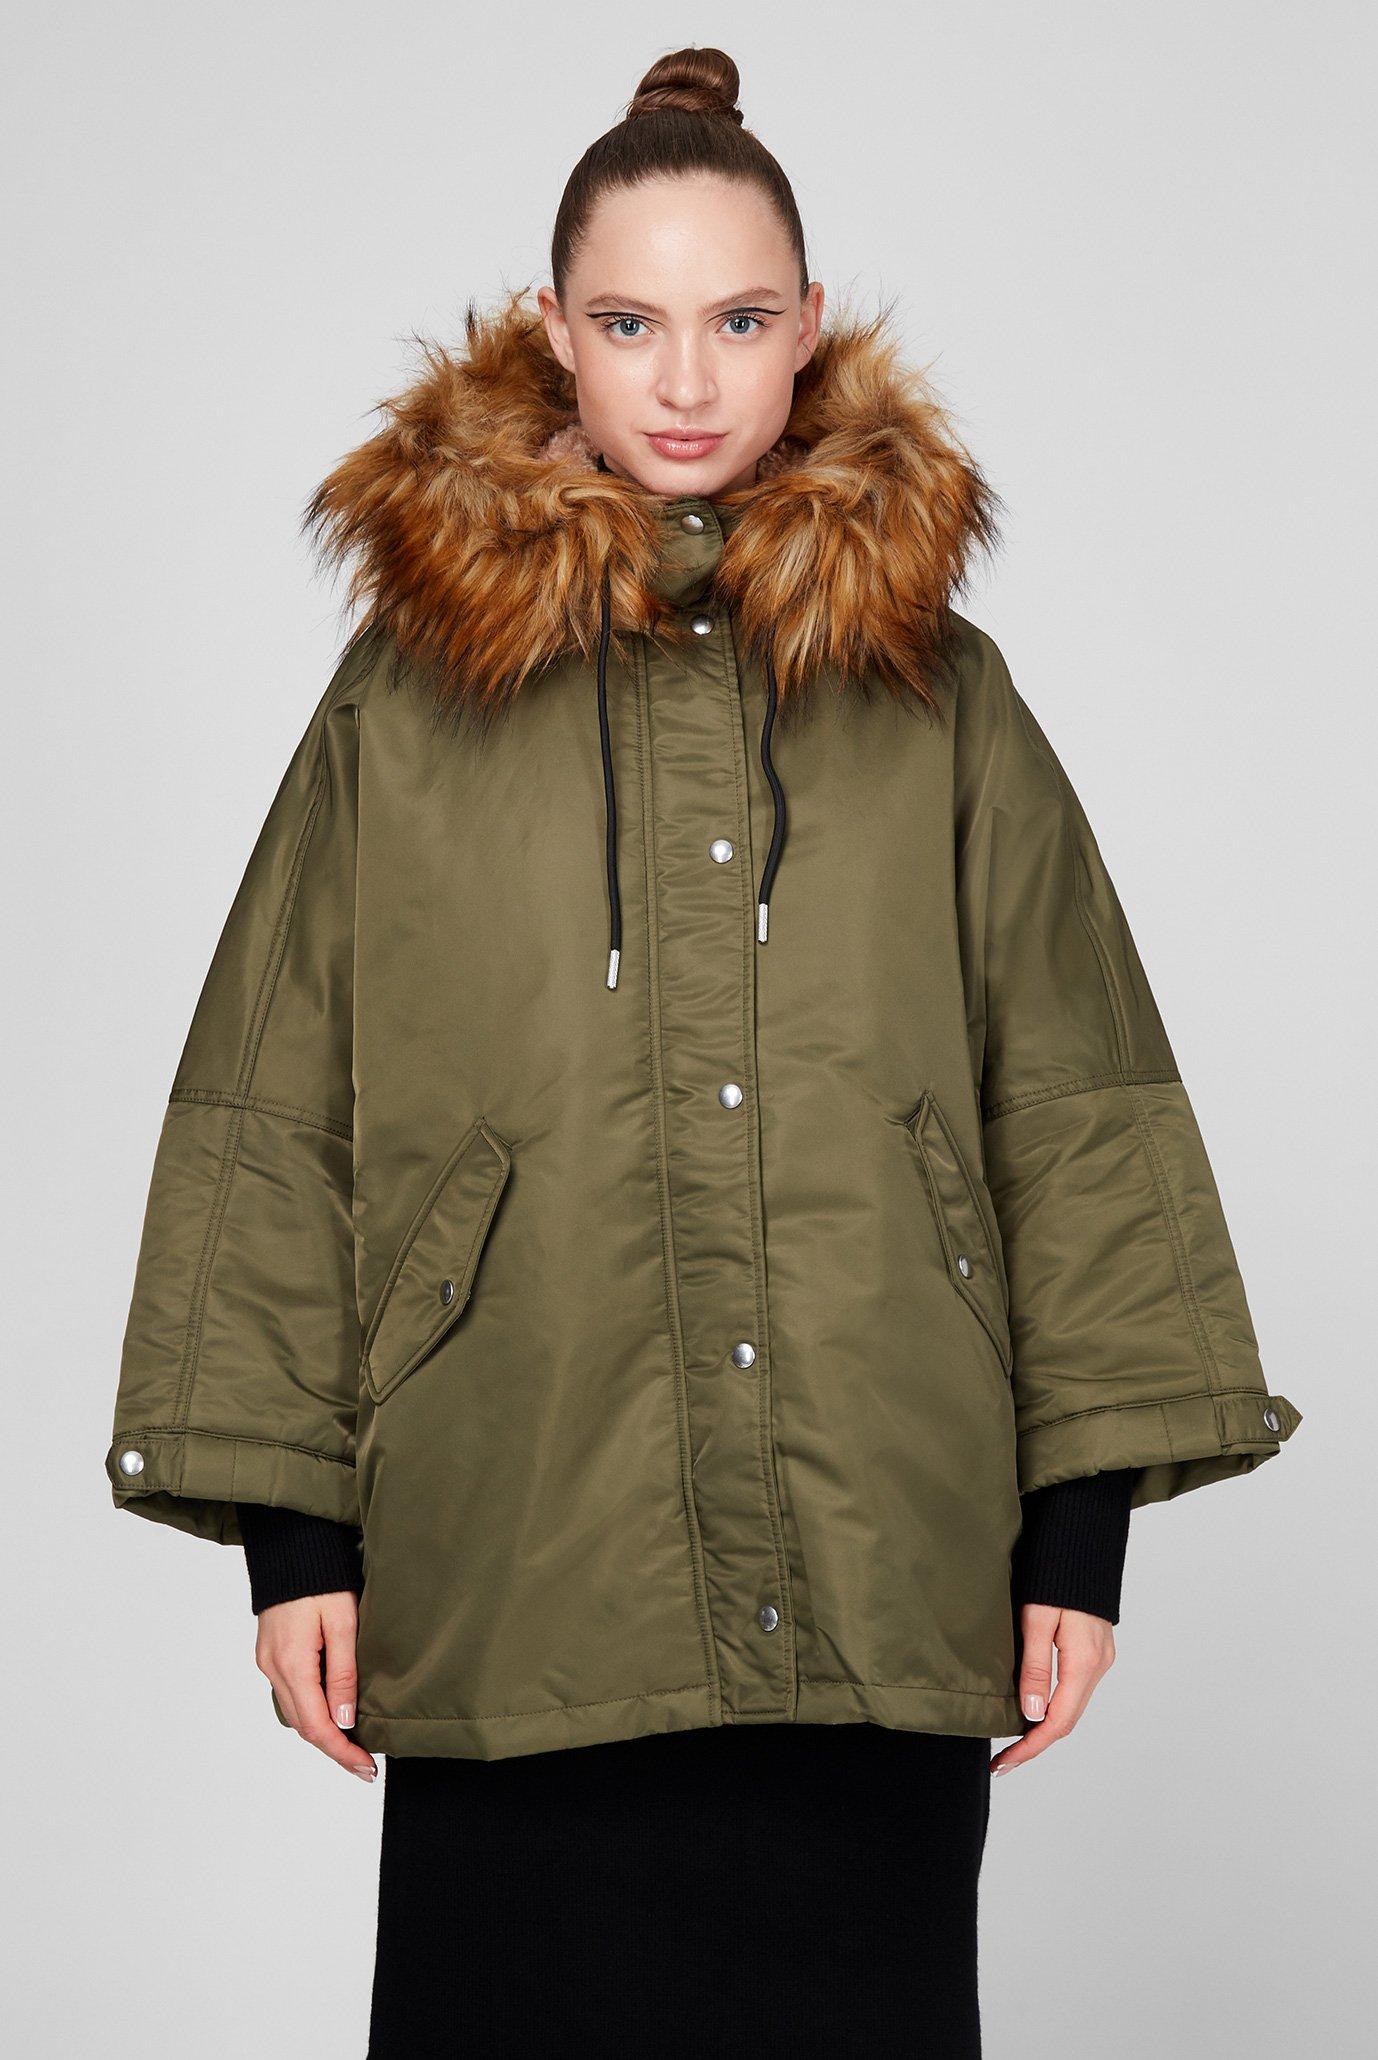 Жіноча зелена куртка W-FLORES 1